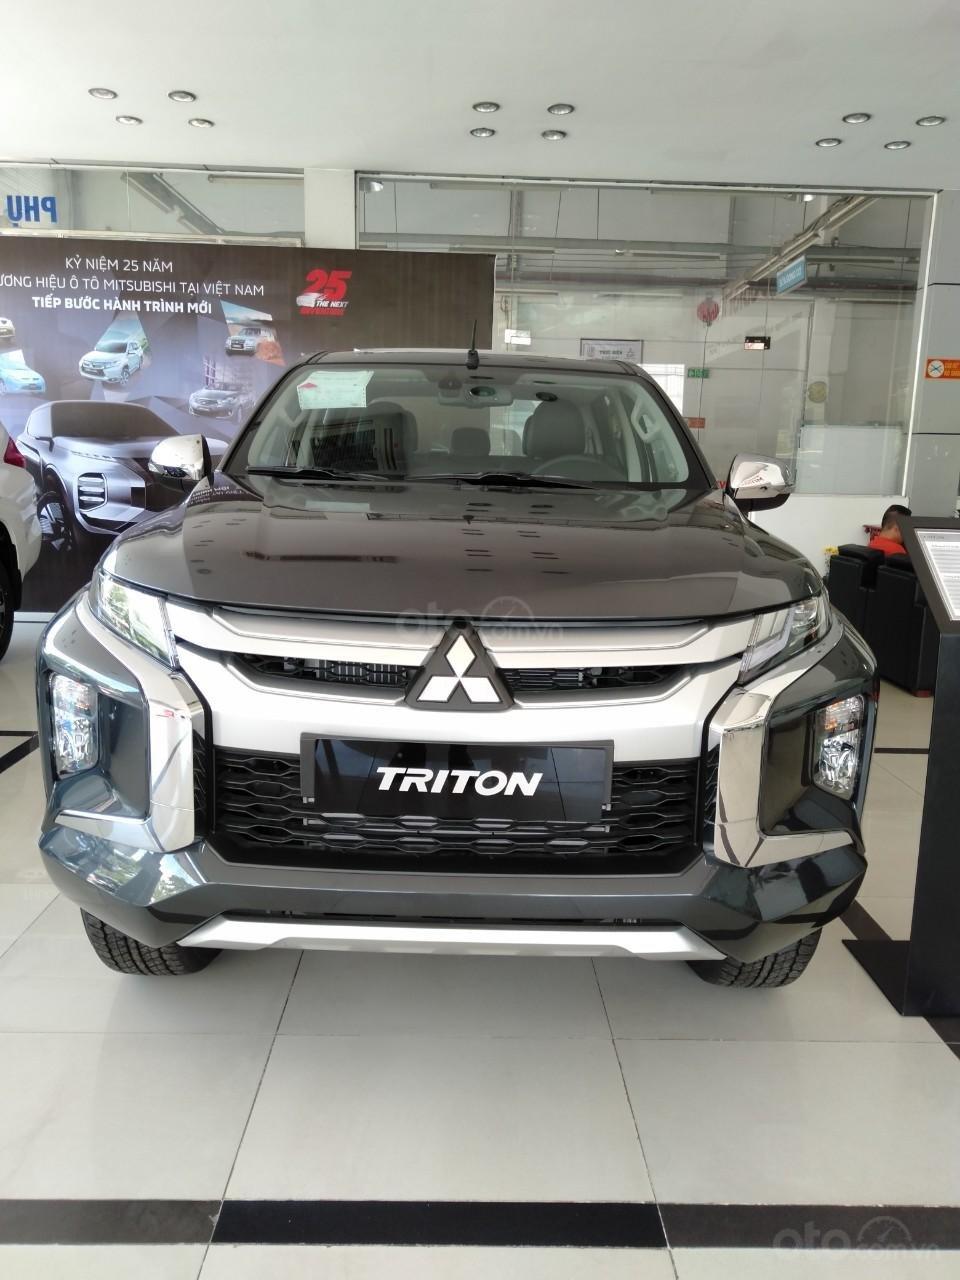 Nhanh tay sở hữu Mitsubishi Triton New 2019-1